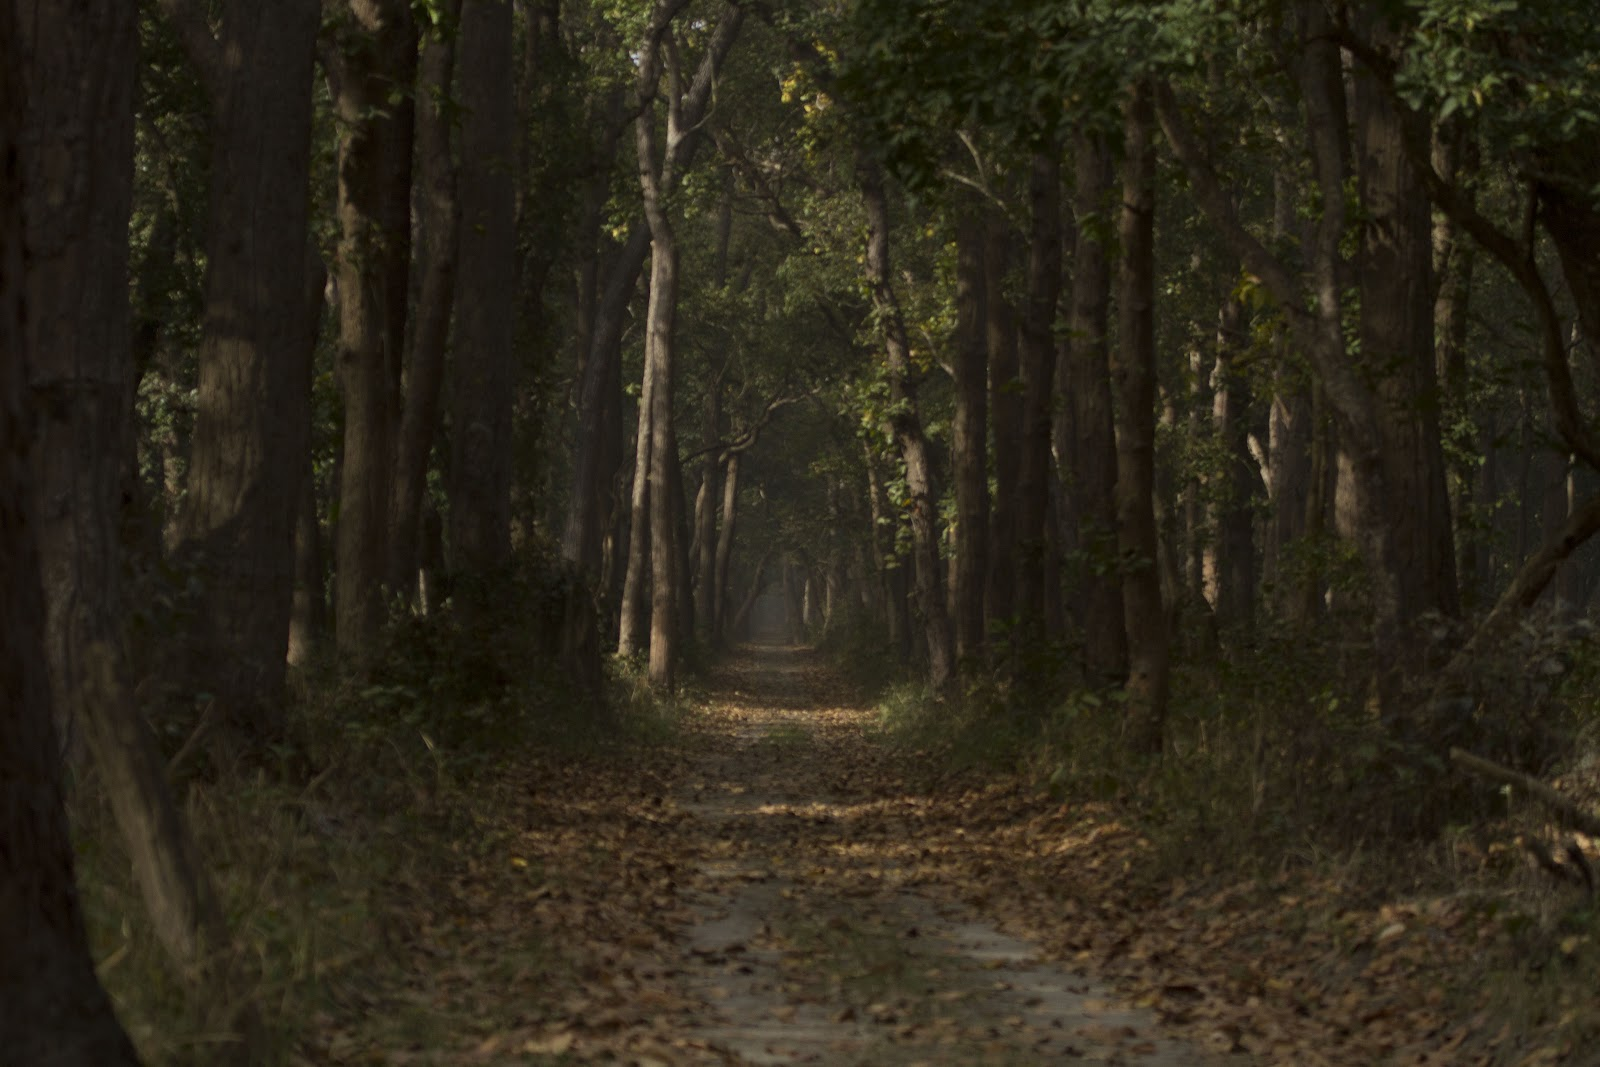 Dudhwa+Landscape+1.JPG